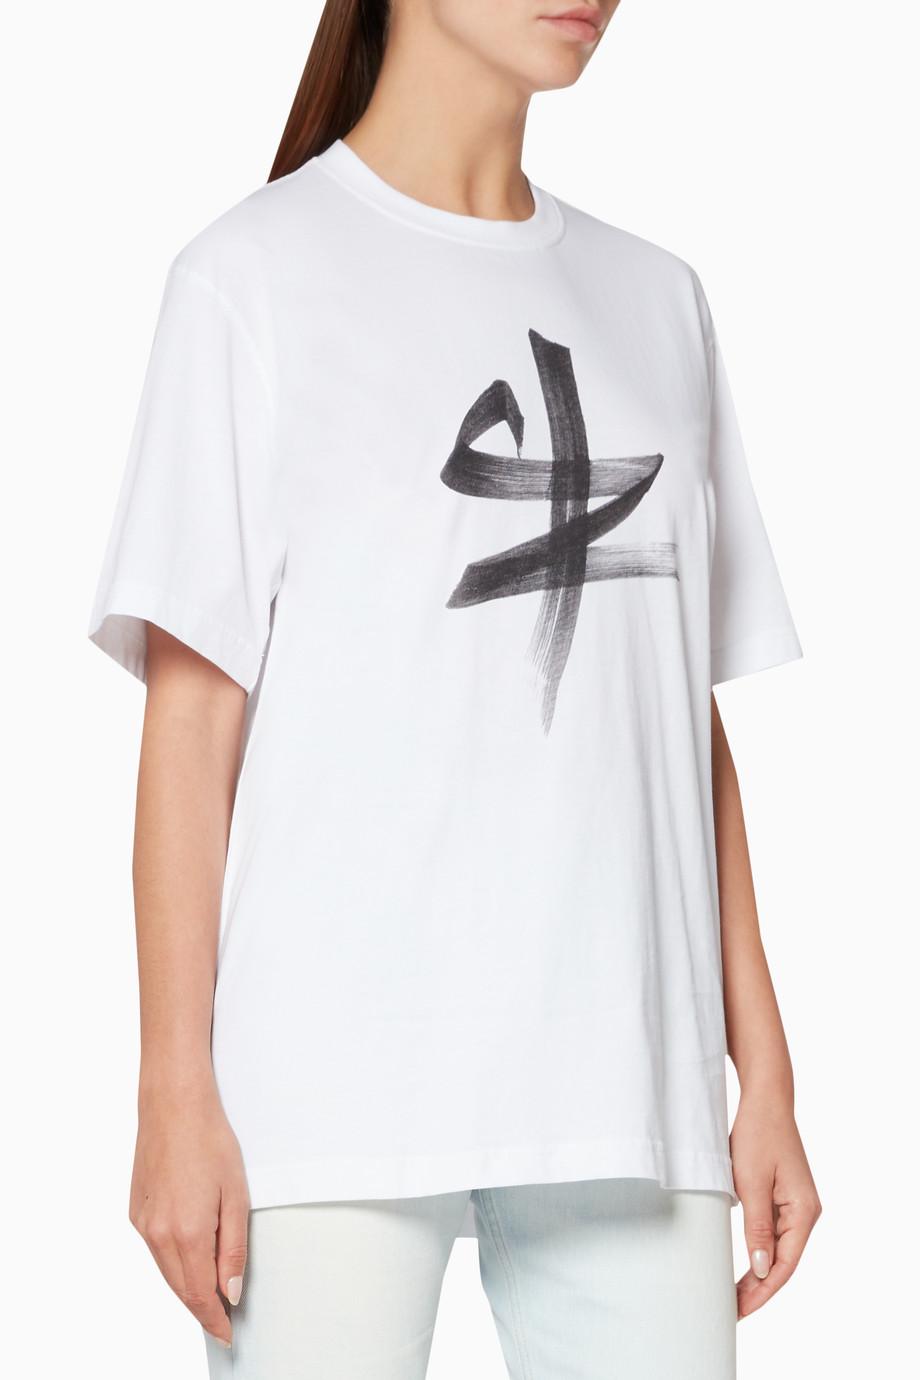 17b6e14d30c11 Shop Vetements White White Ox Chinese Zodiac T-Shirt for Women ...